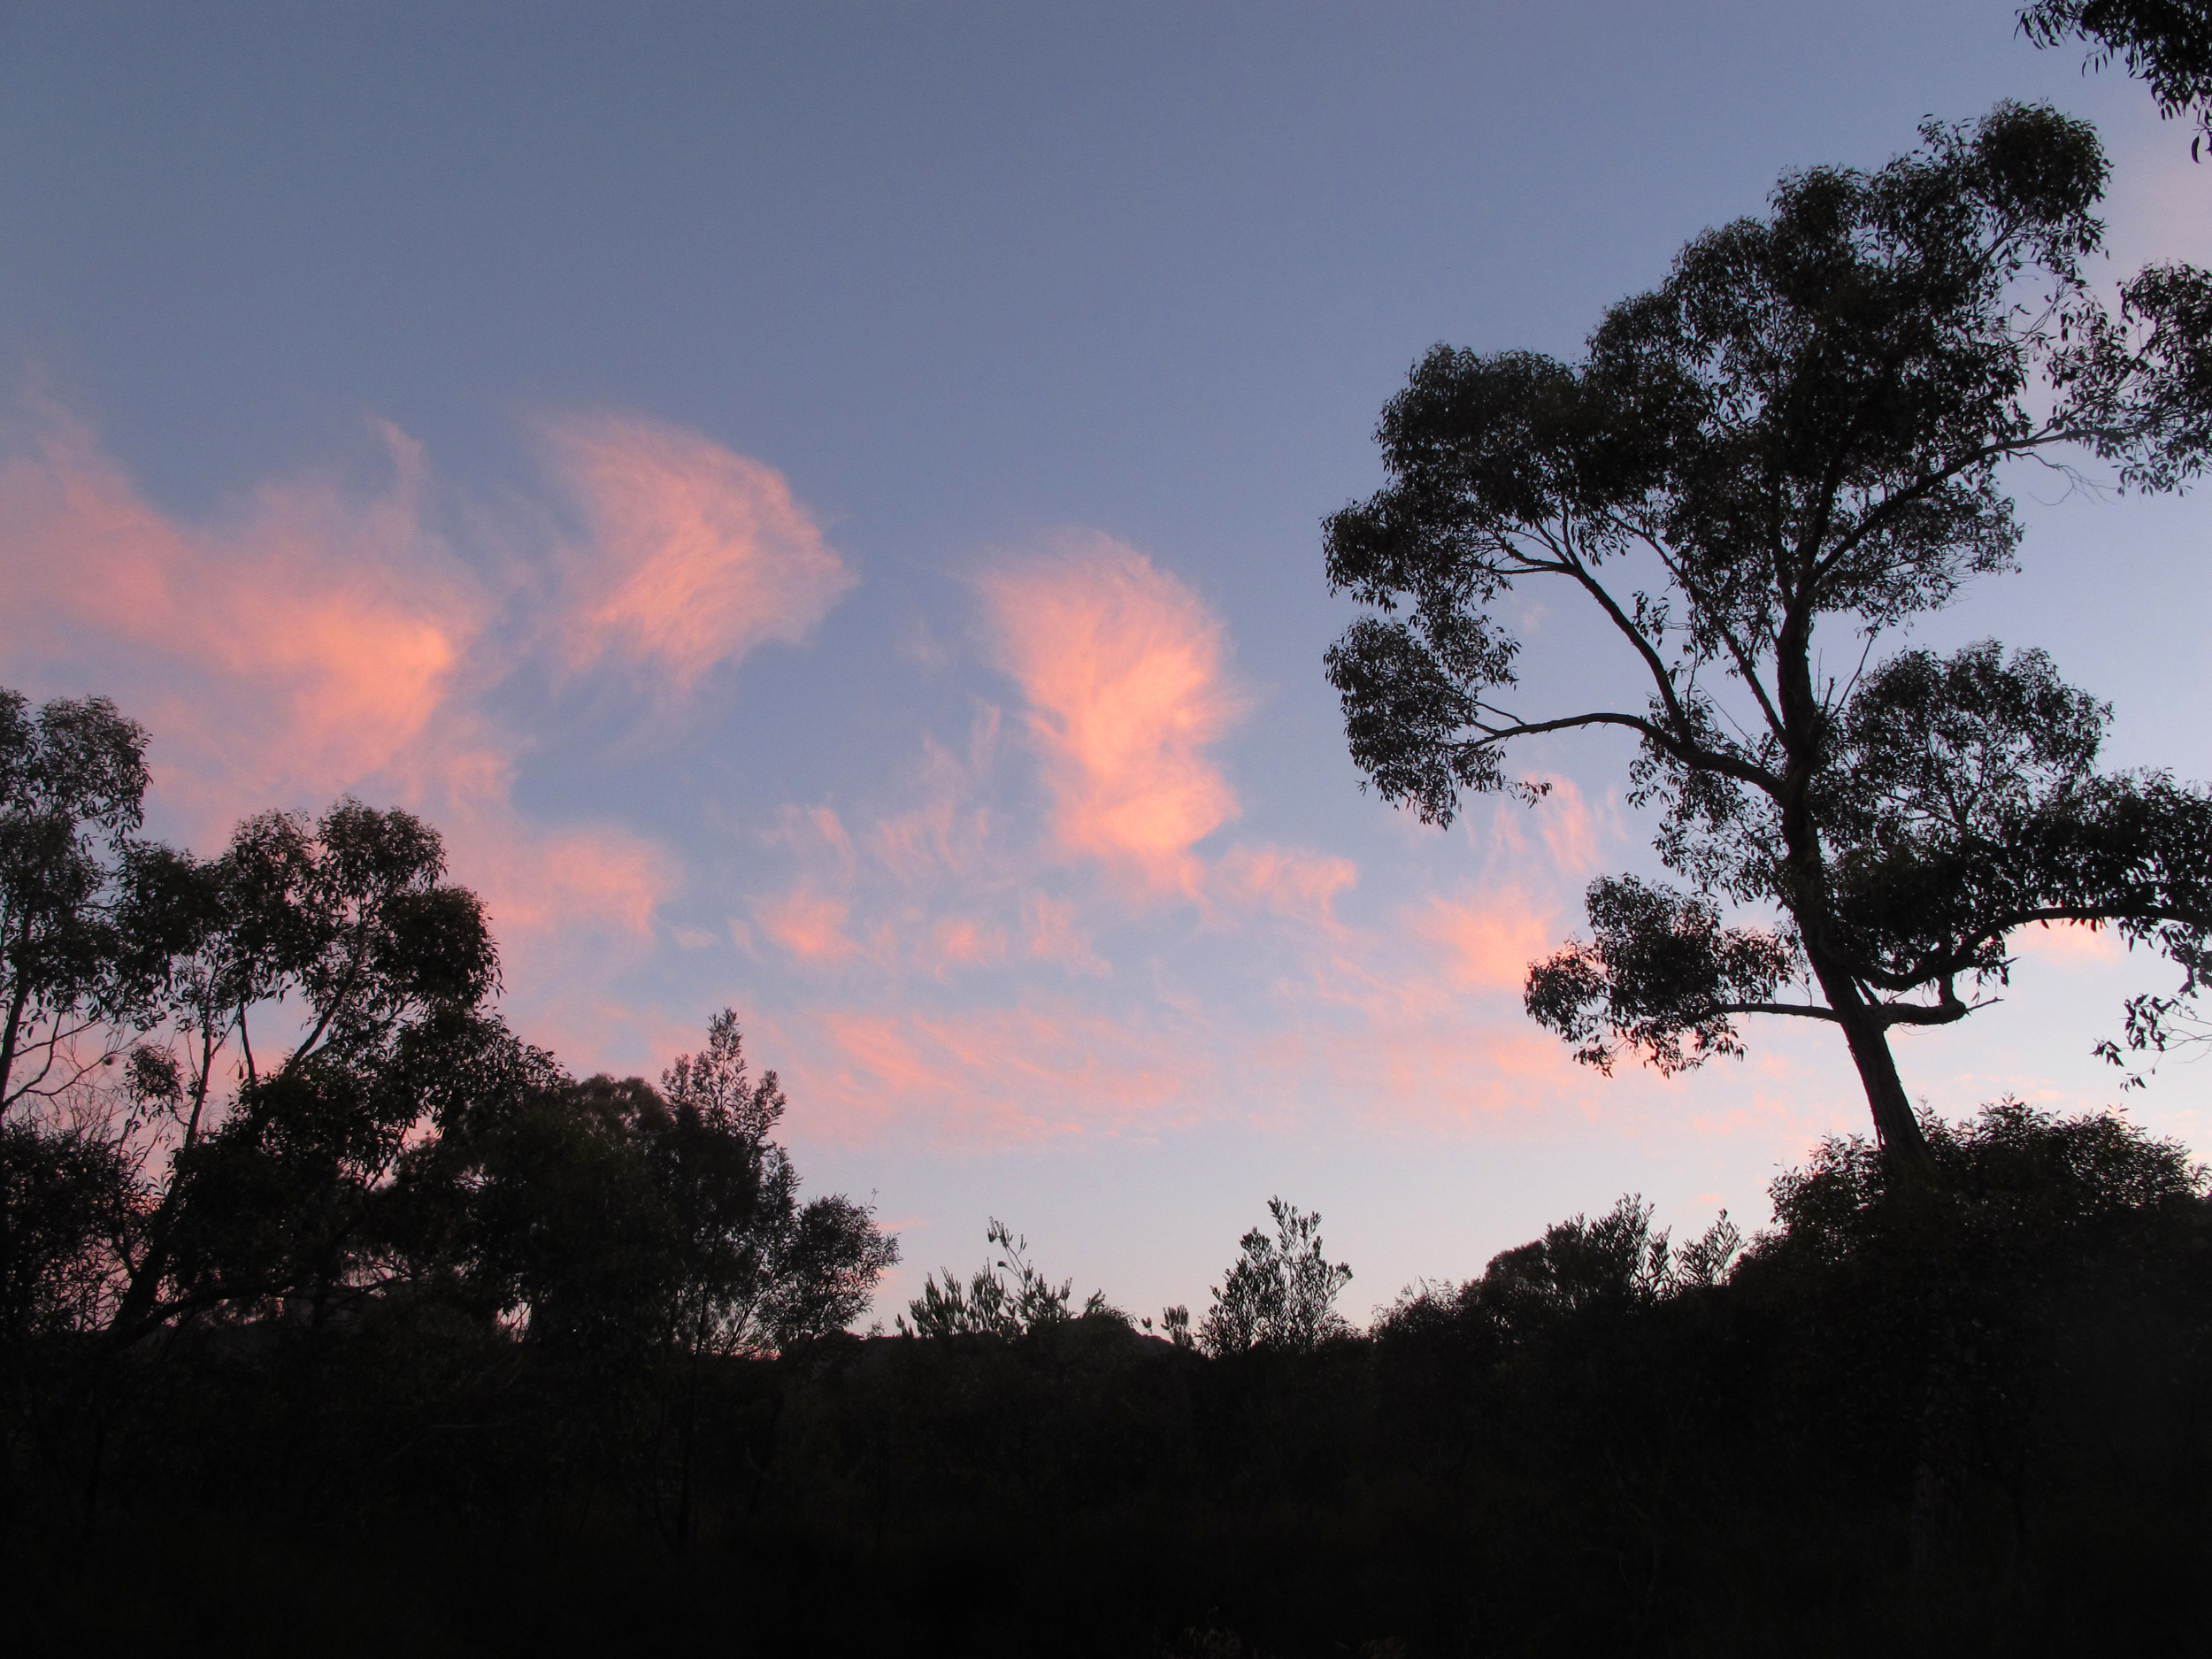 Grampians campsite sunset, summer 2012.